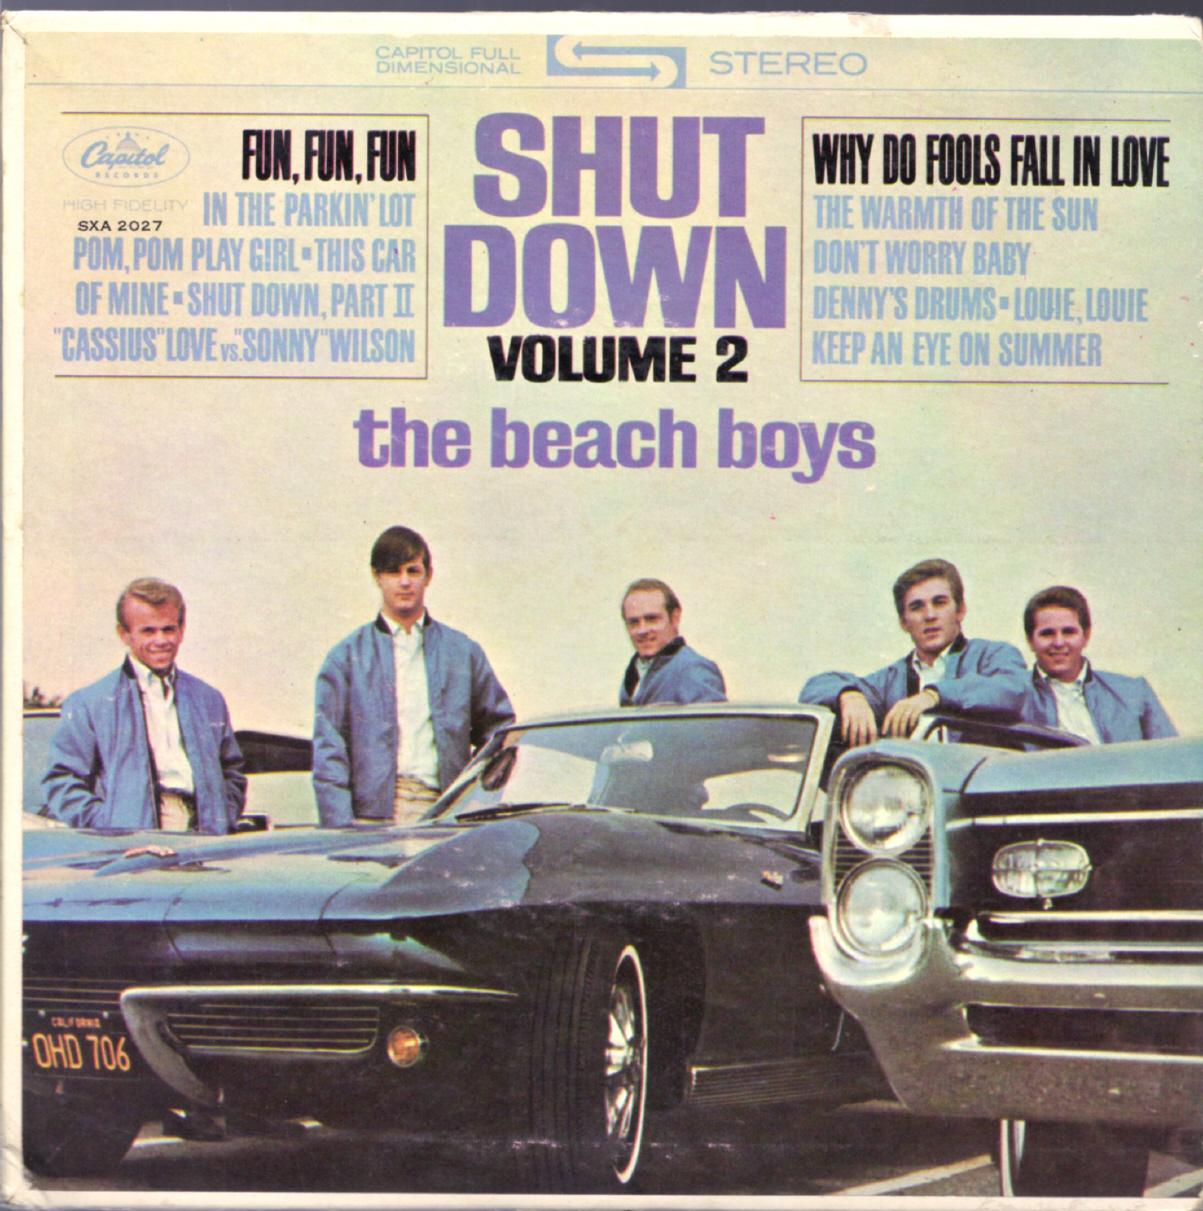 The Beach Boys - Surfer Girl & Shut Down Volume 2